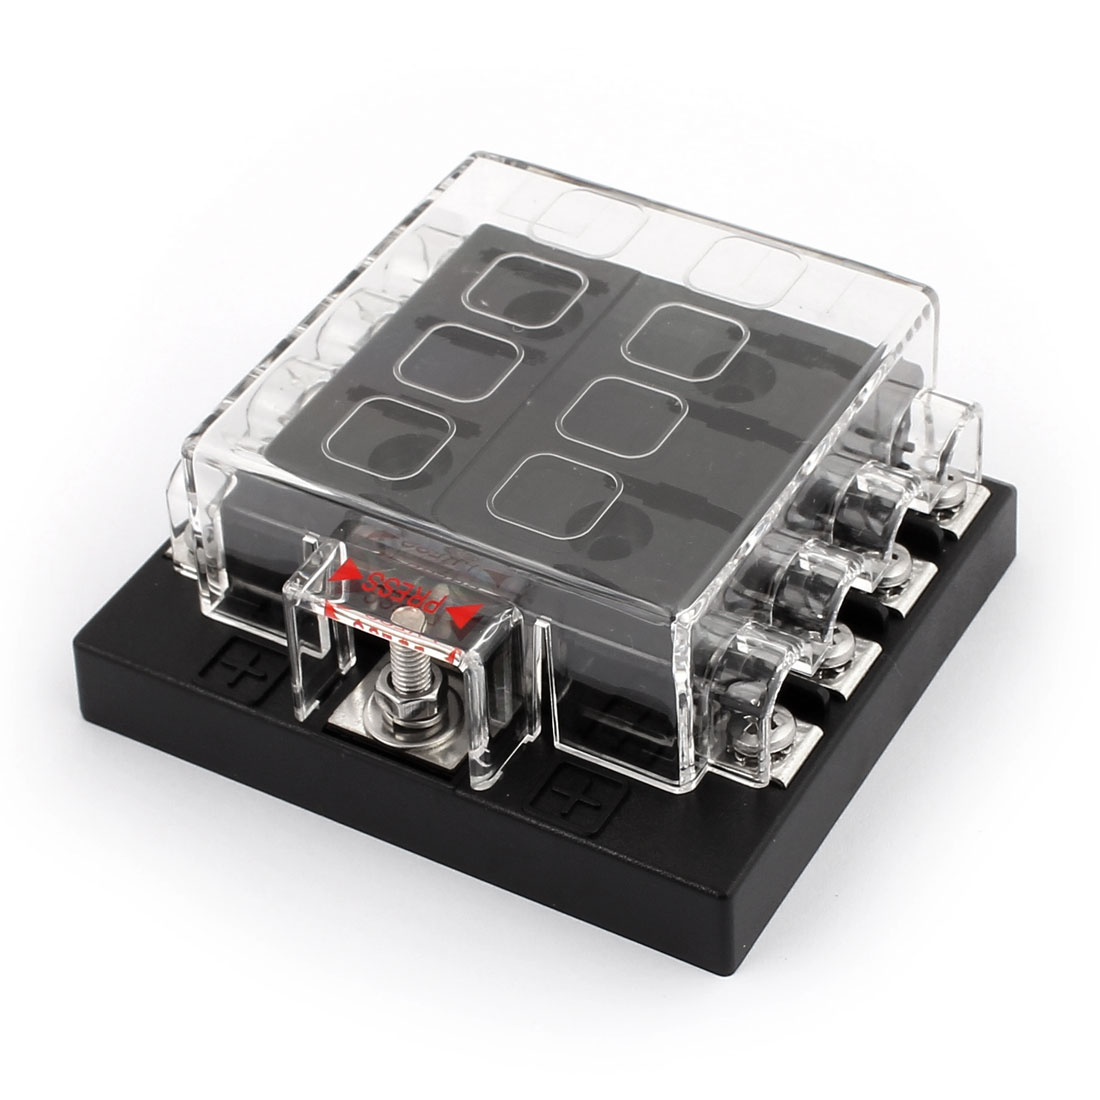 8 fuse block holder box wiring diagram dat 8 fuse block holder box [ 1100 x 1100 Pixel ]